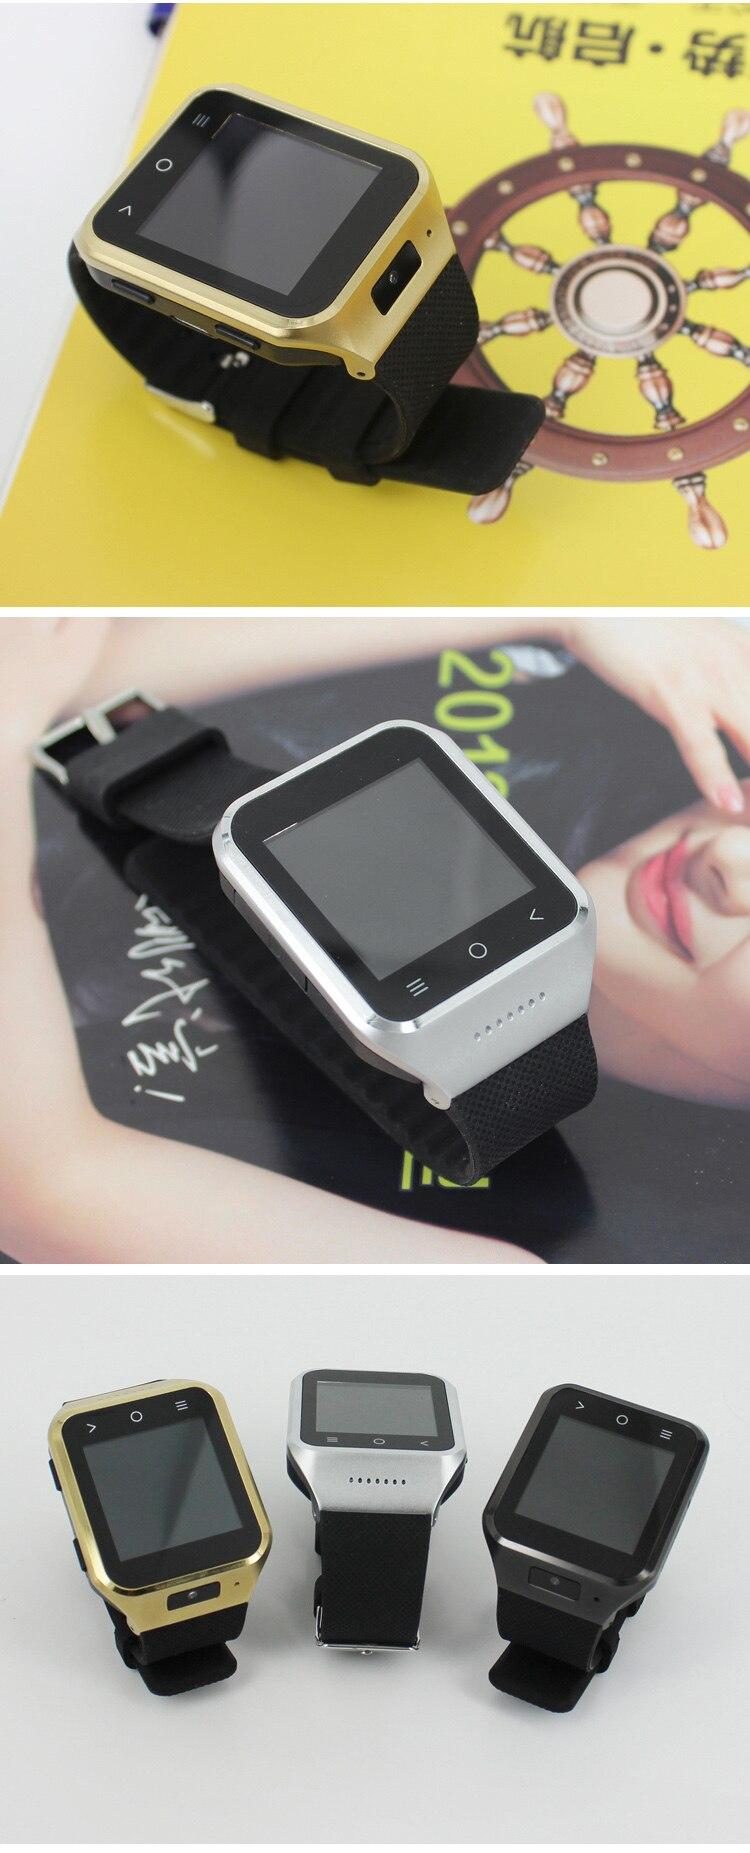 New Android Smart Watch Wrist watch MTK6572 Dual Core 4GB+8GB Rom 512MB Ram 1.54 inch 5.0MP Camera Wifi 3G GPS Smartwatch Phone